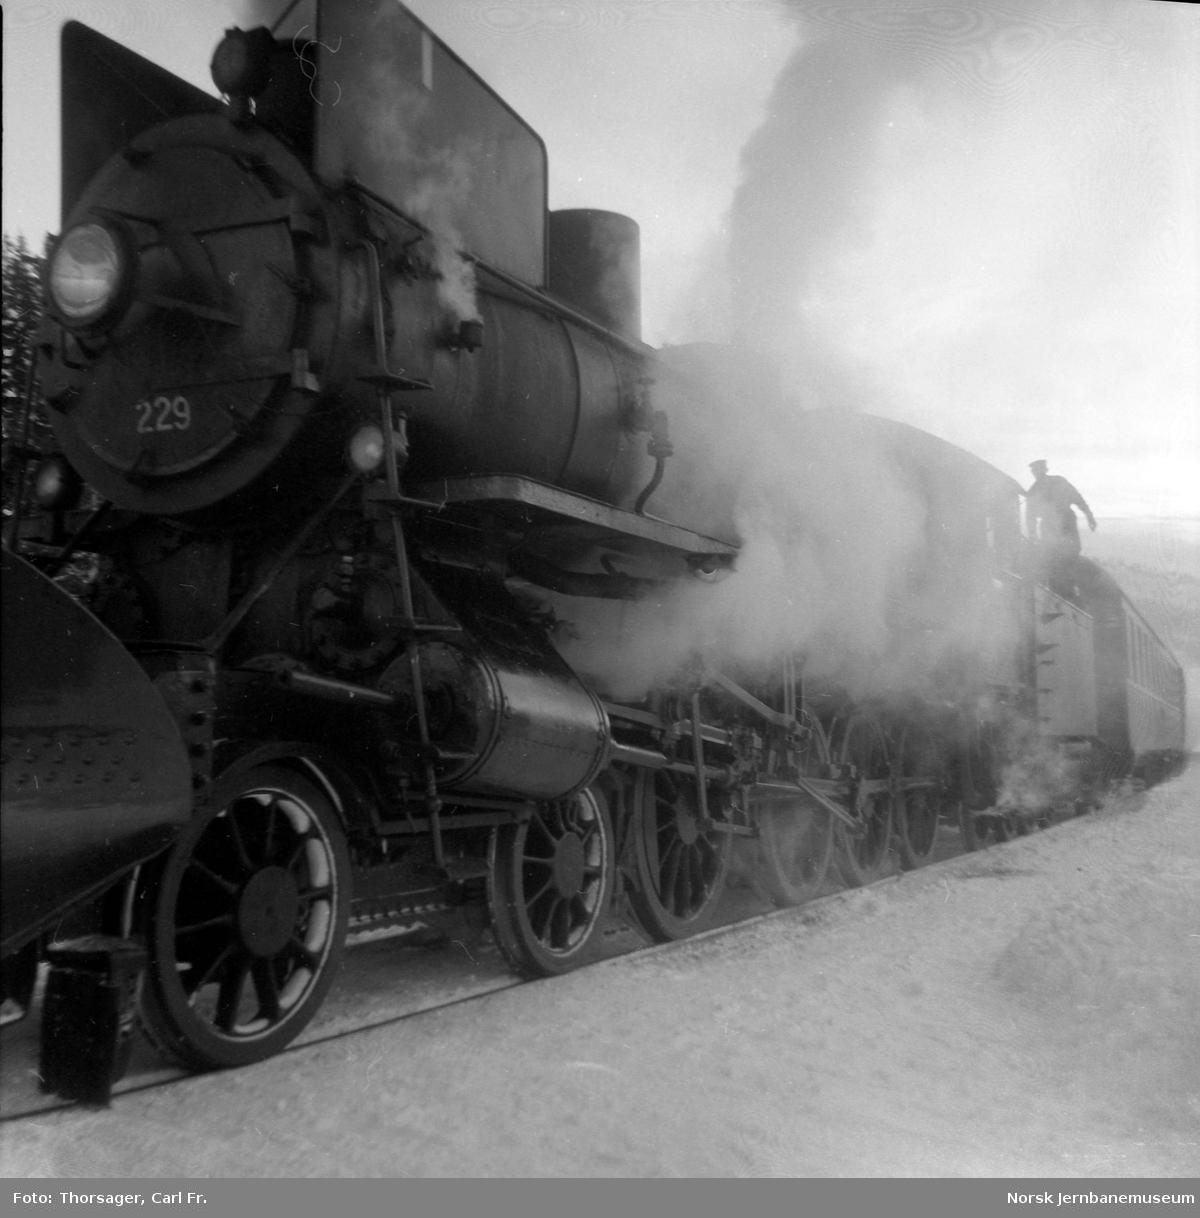 Damplokomotiv type 26b nr. 229 et sted mellom Hamar og Koppang